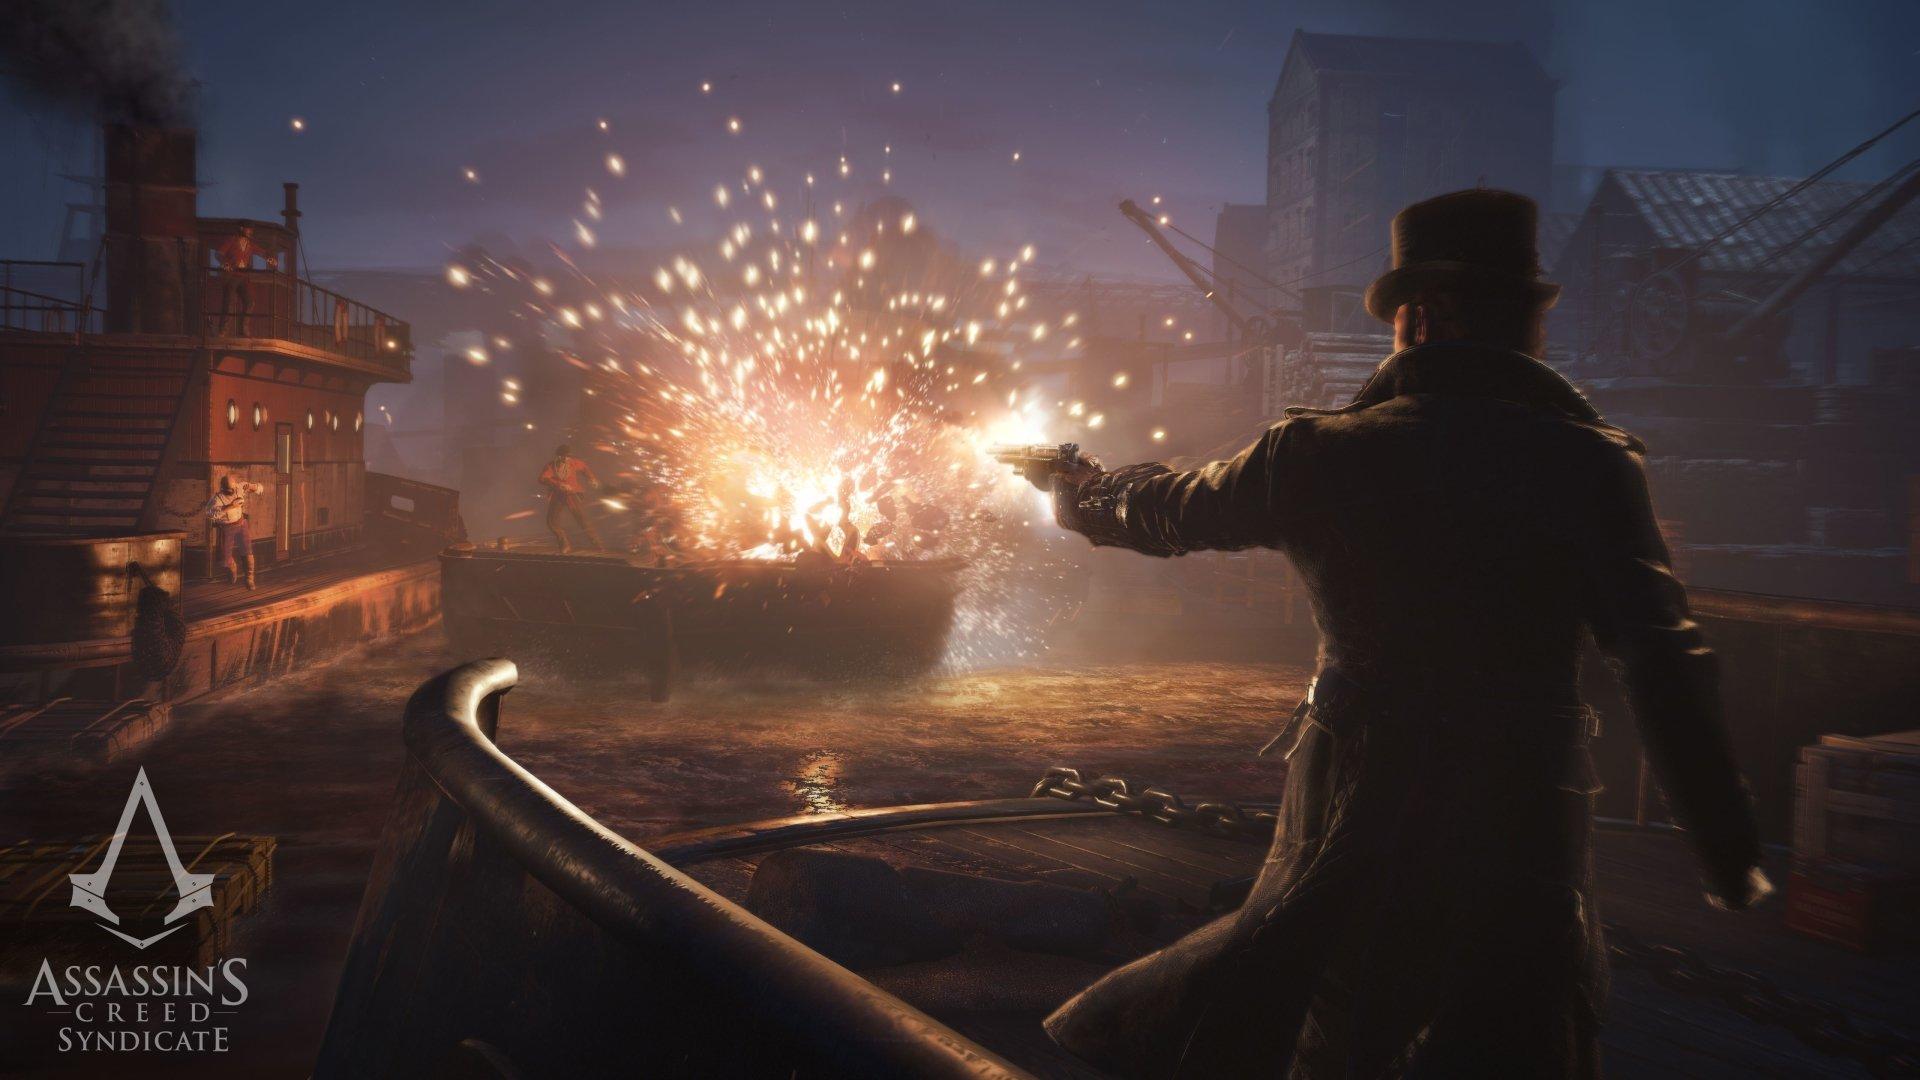 Assassin 39 s creed syndicate 4k ultra hd sfondo and sfondi for Assassin s creed sfondi